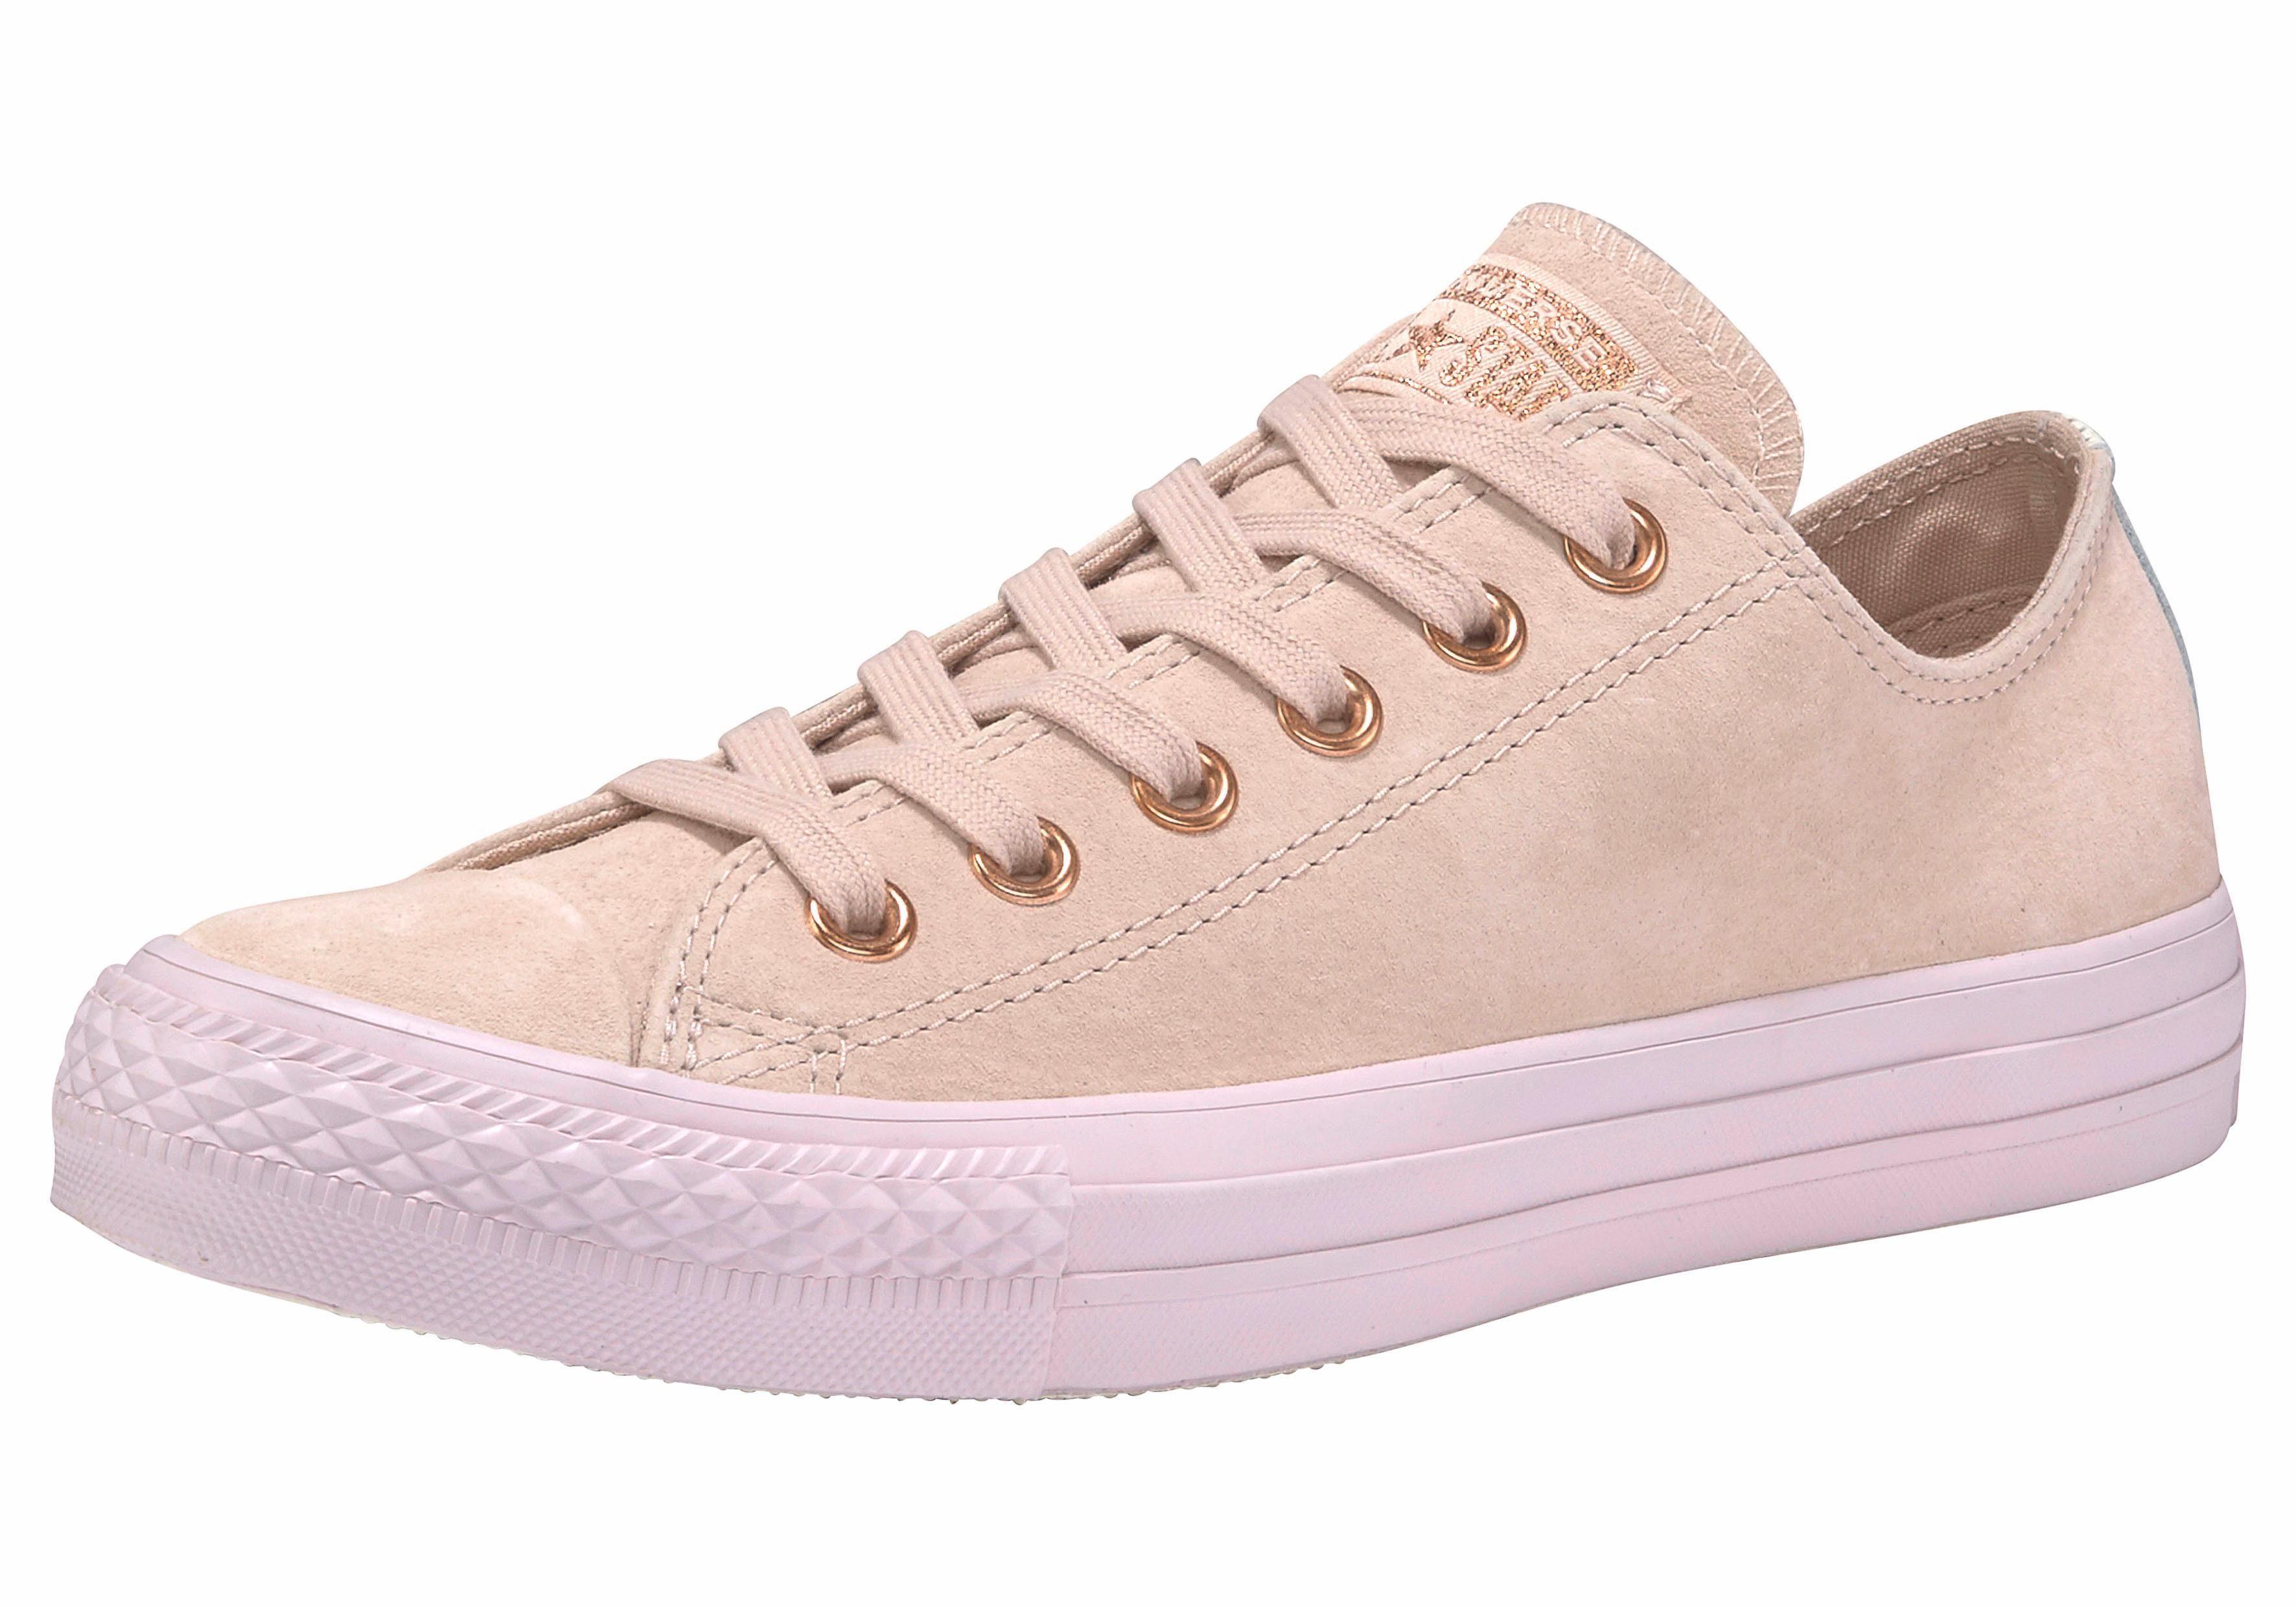 Converse »Chuck Taylor All Star Ox Cherry Blossom Tonal« Sneaker online kaufen | OTTO